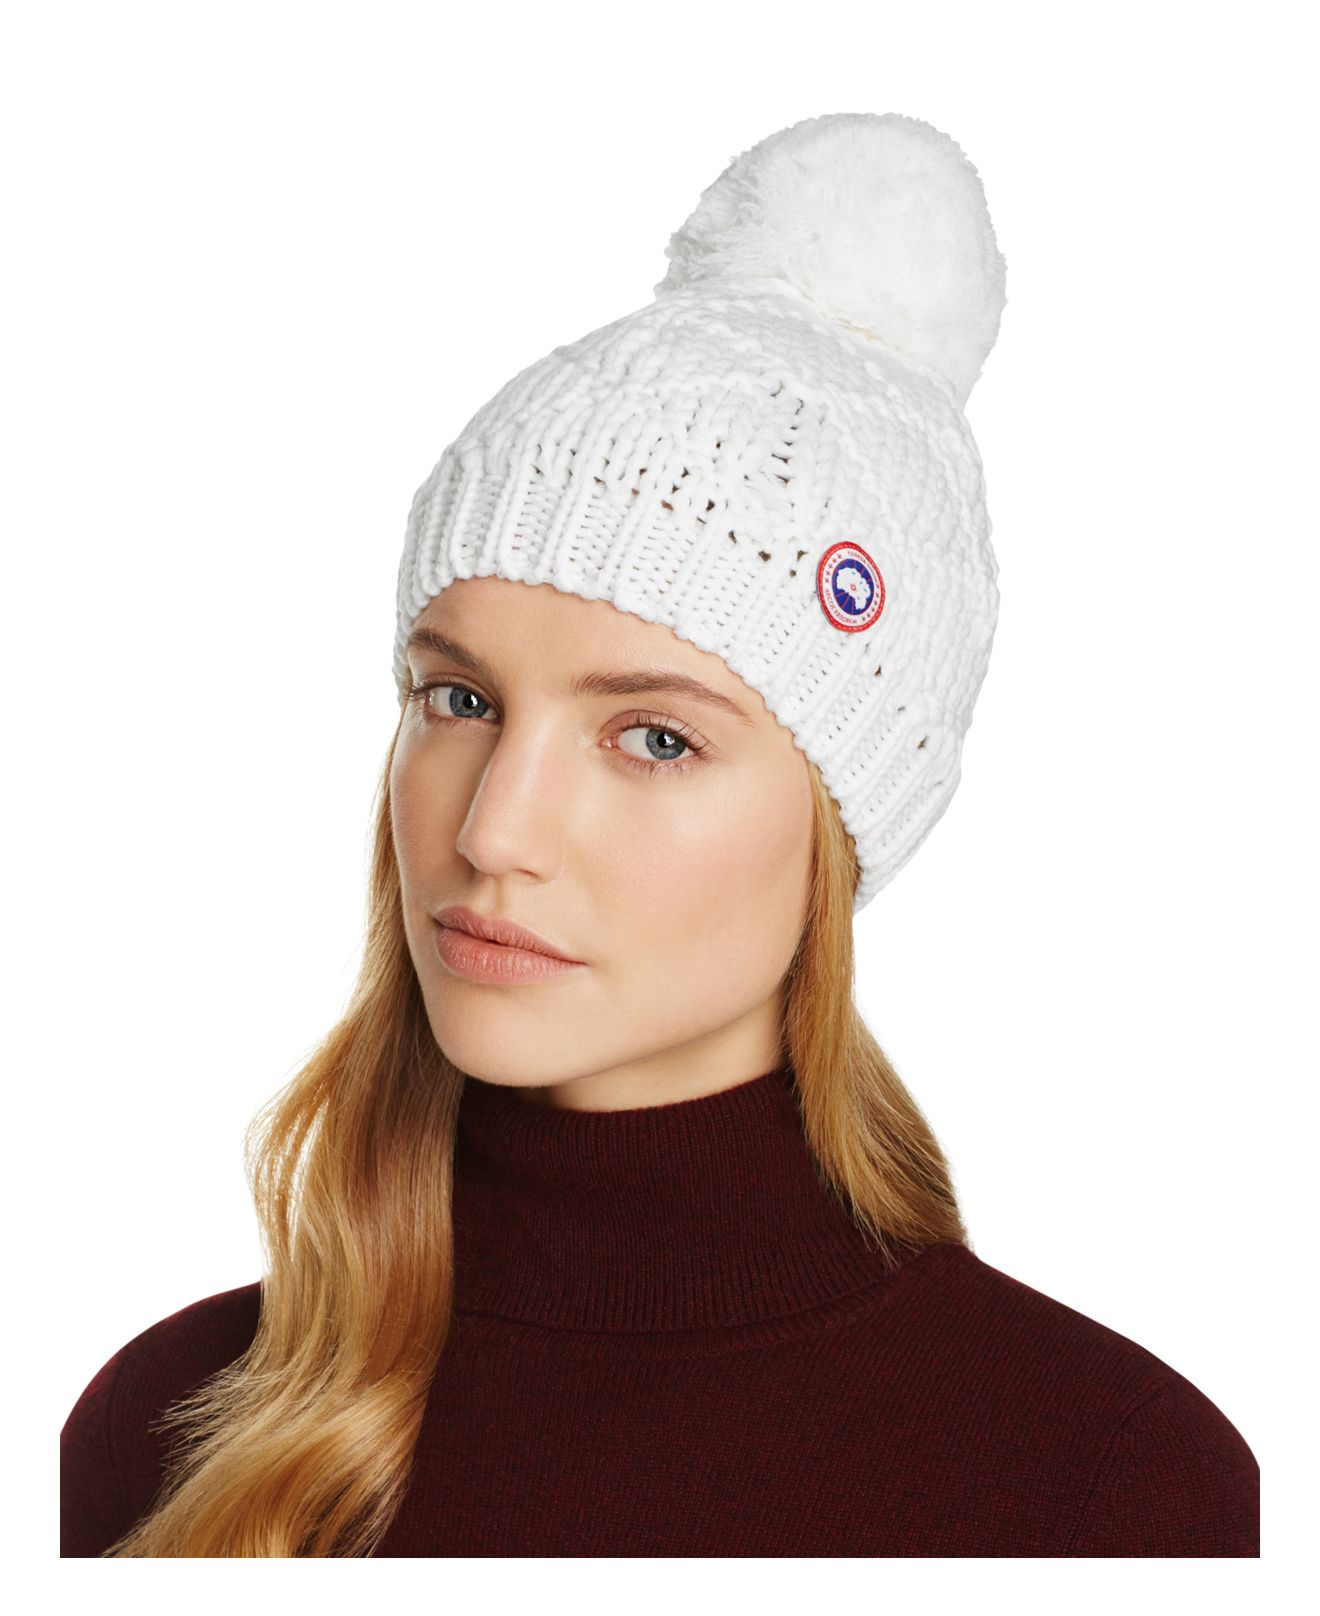 03167682fad Lyst - Canada Goose Merino Wool Beanie With Oversized Pom-pom in White